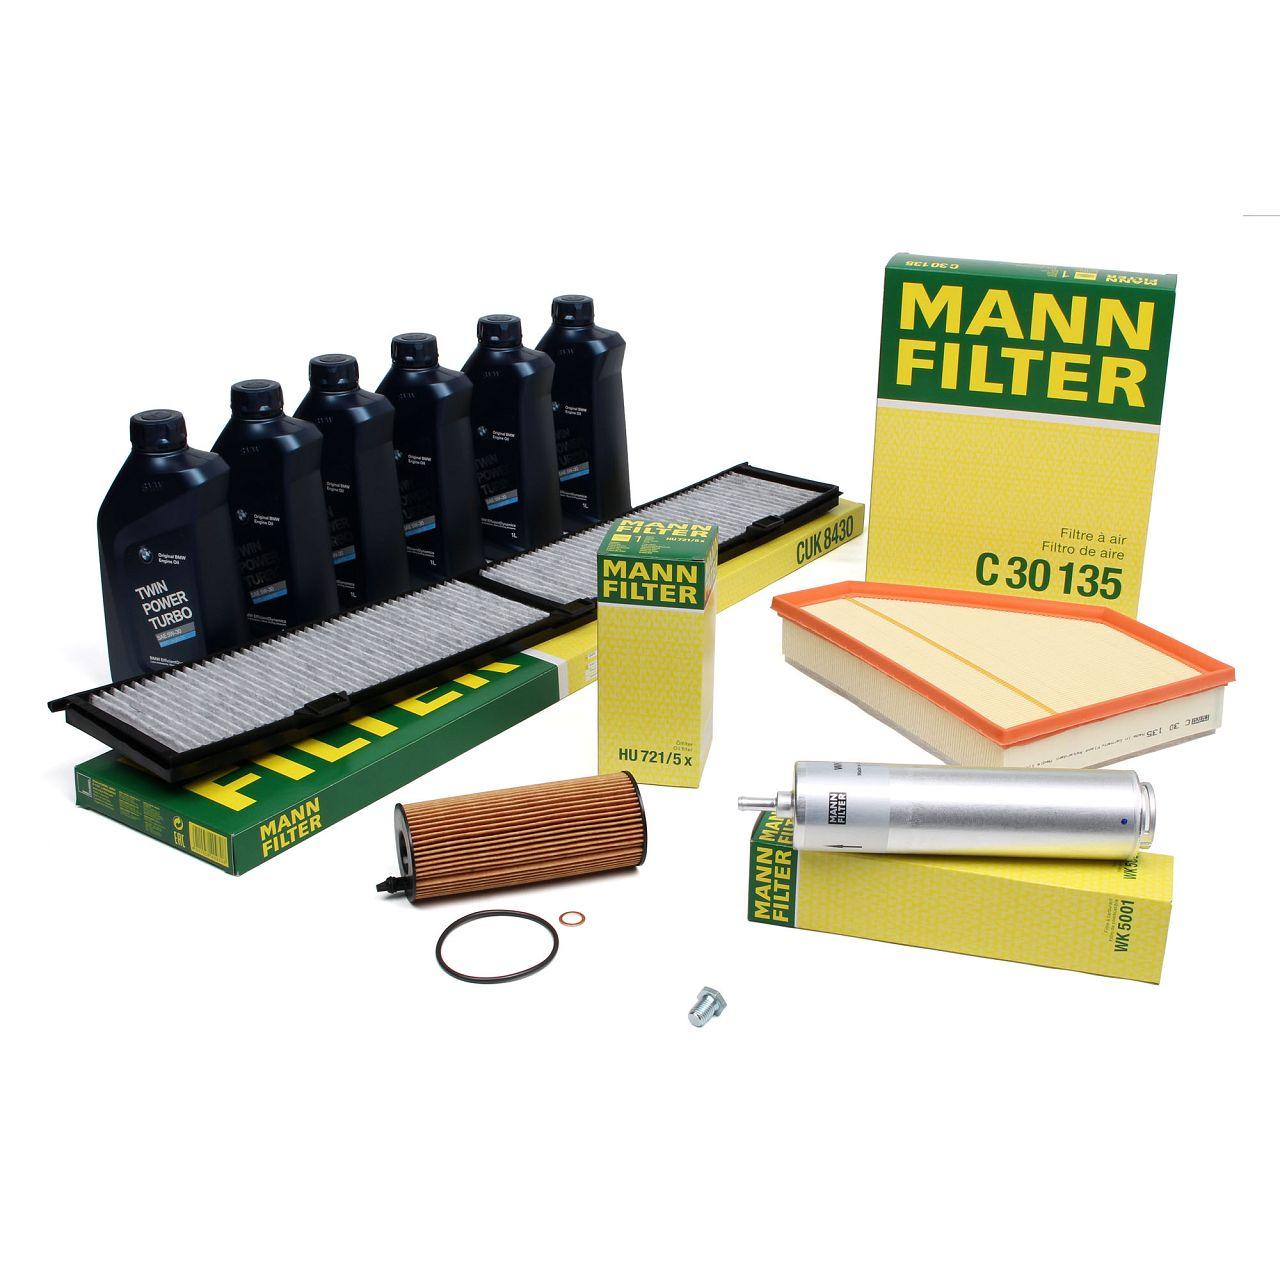 MANN Filterset + 6 L ORIGINAL BMW 5W30 Motoröl 3er E90 E91 E92 E93 316-320d bis 01.2010